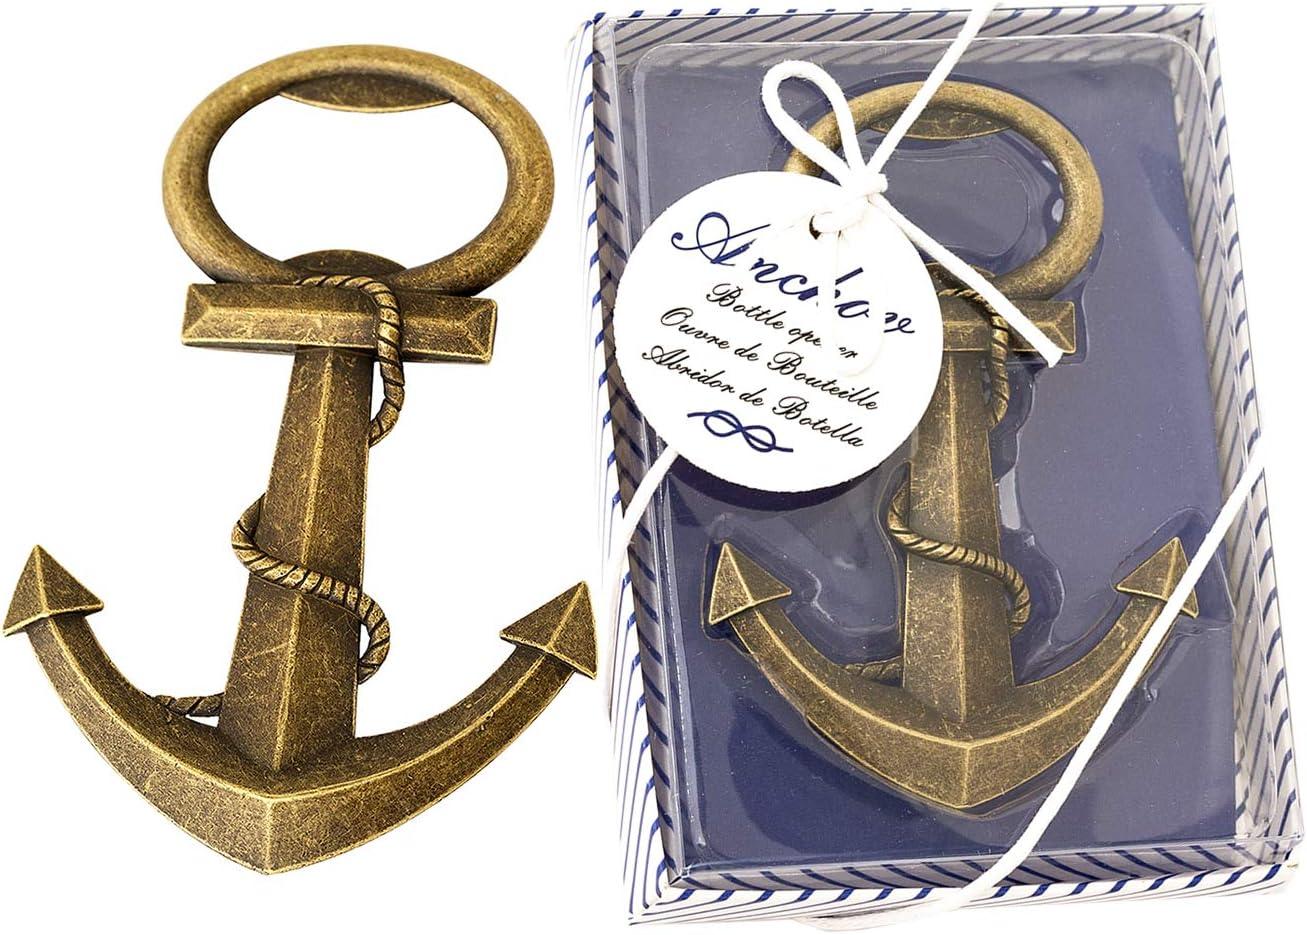 Nautical Theme Anchor Pinback Anchors N003 Sailing Cruise Ready to Ship 16 Buttons 1 Pinback Button Travel Theme